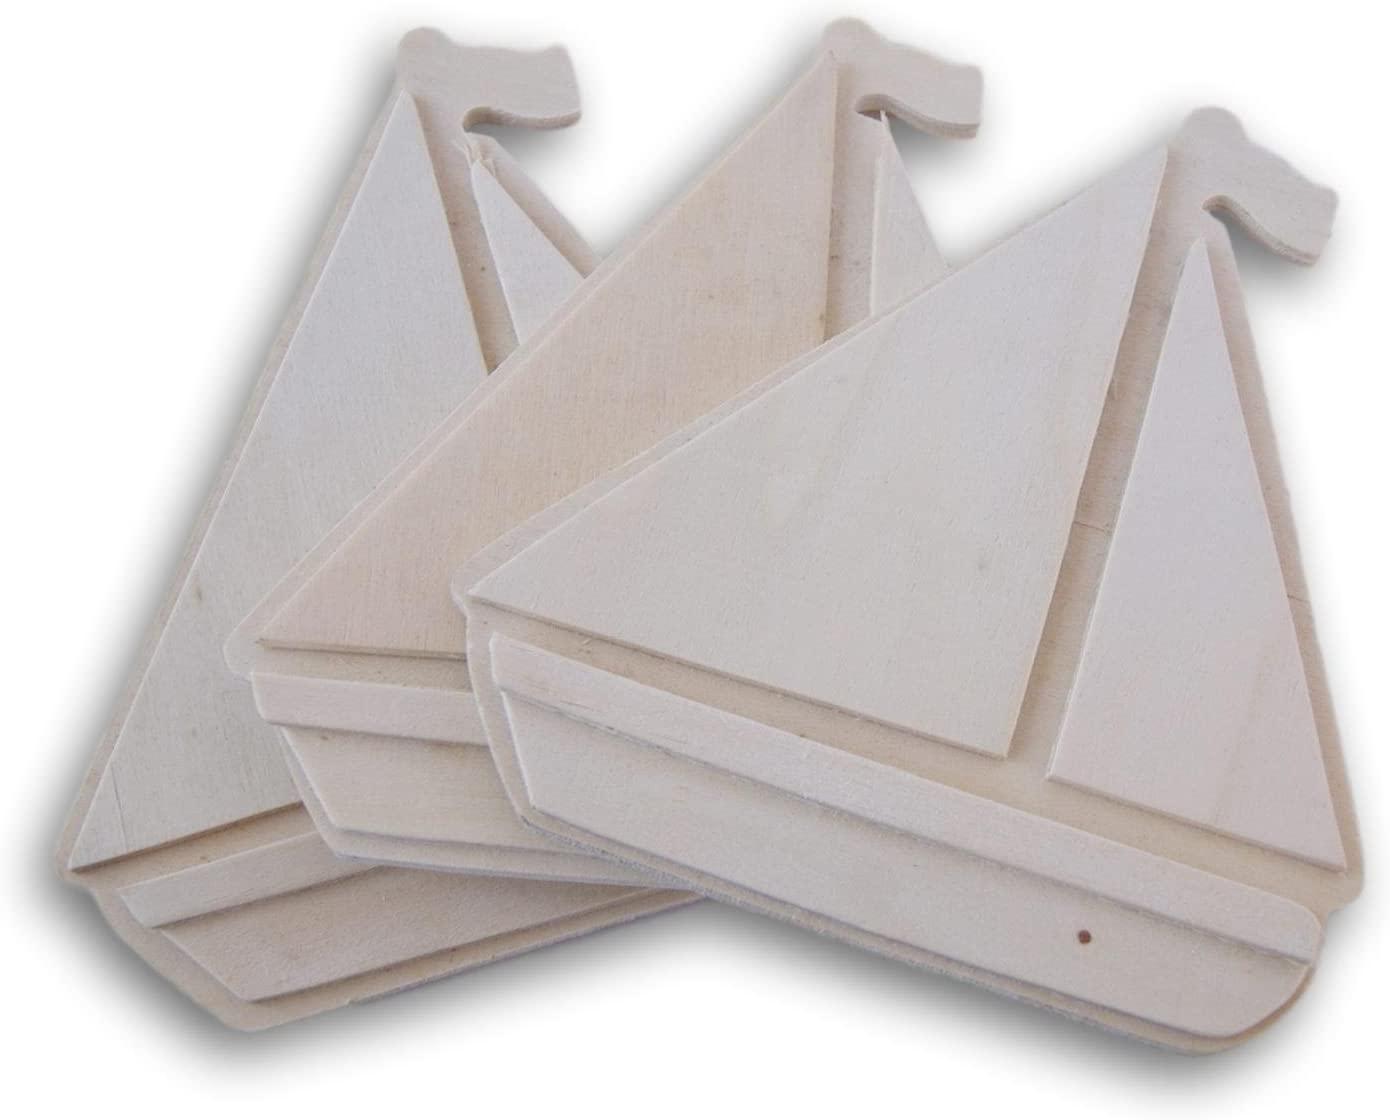 Darice Unpainted Wood Cutout - Large Sailboat Shape - Set of 3